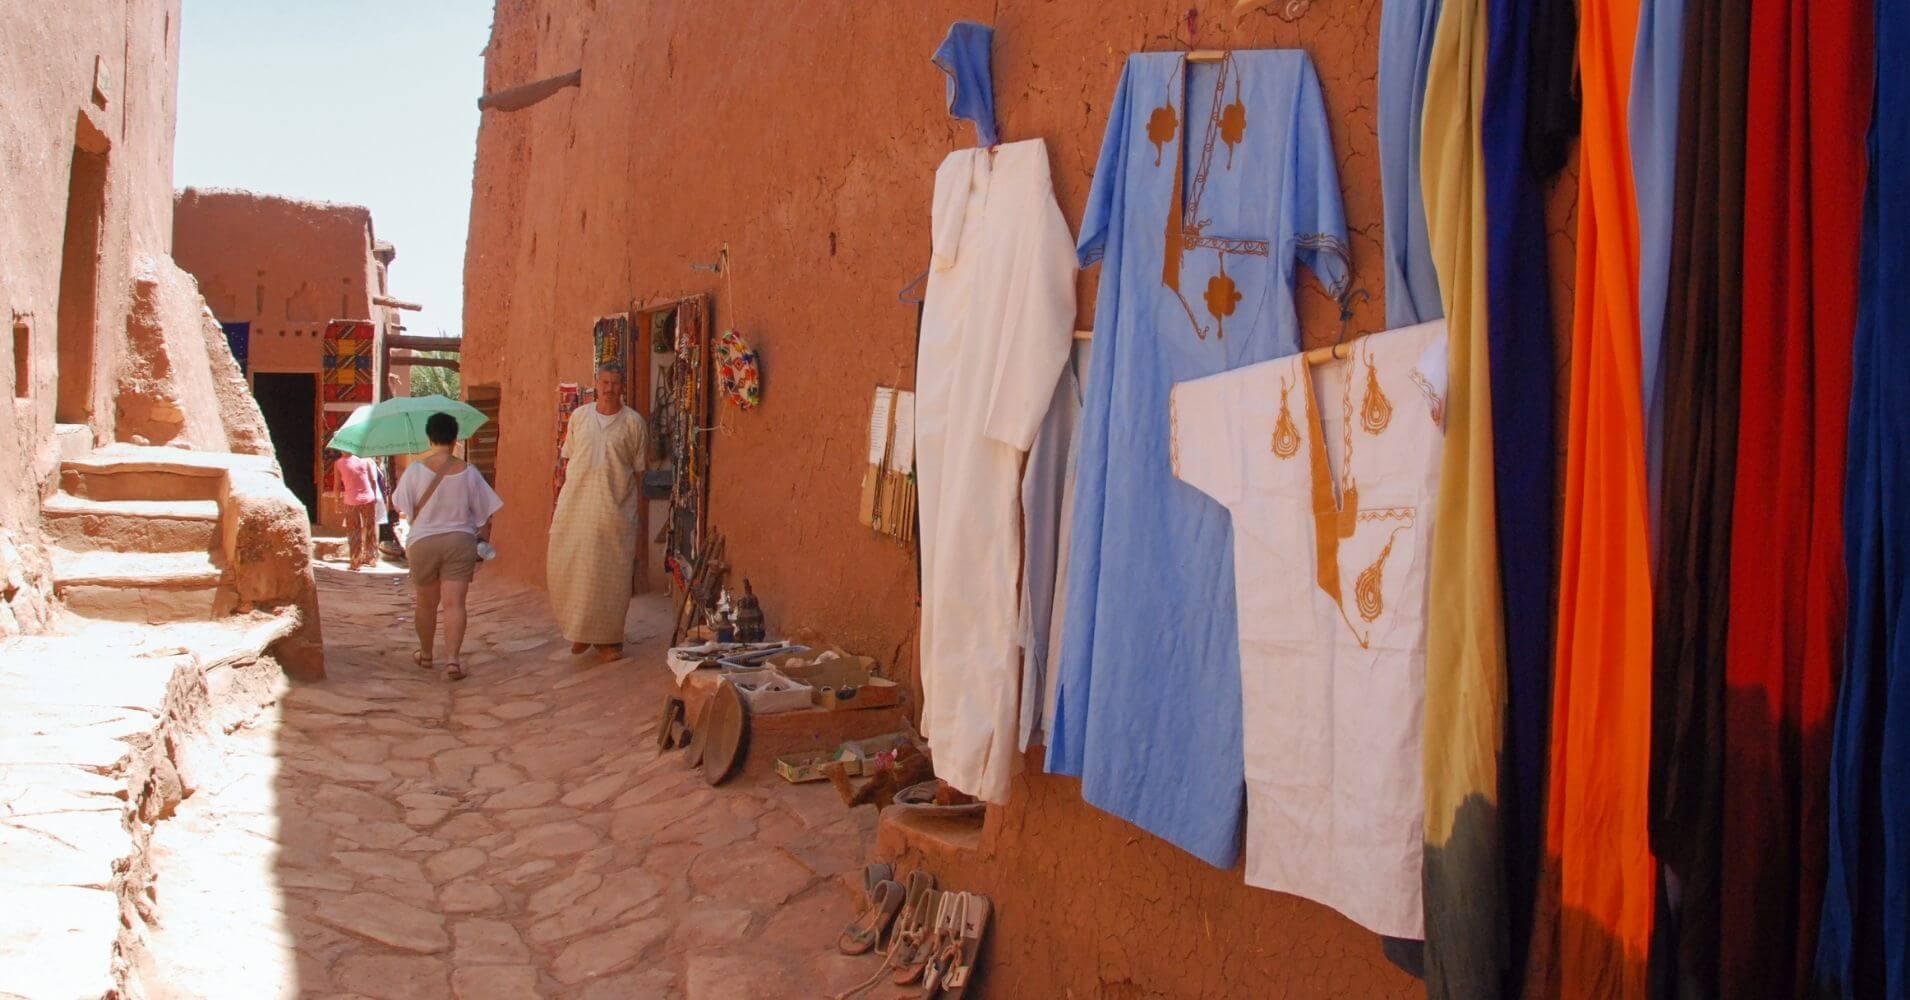 Paseo por la Kasbah, Marruecos.